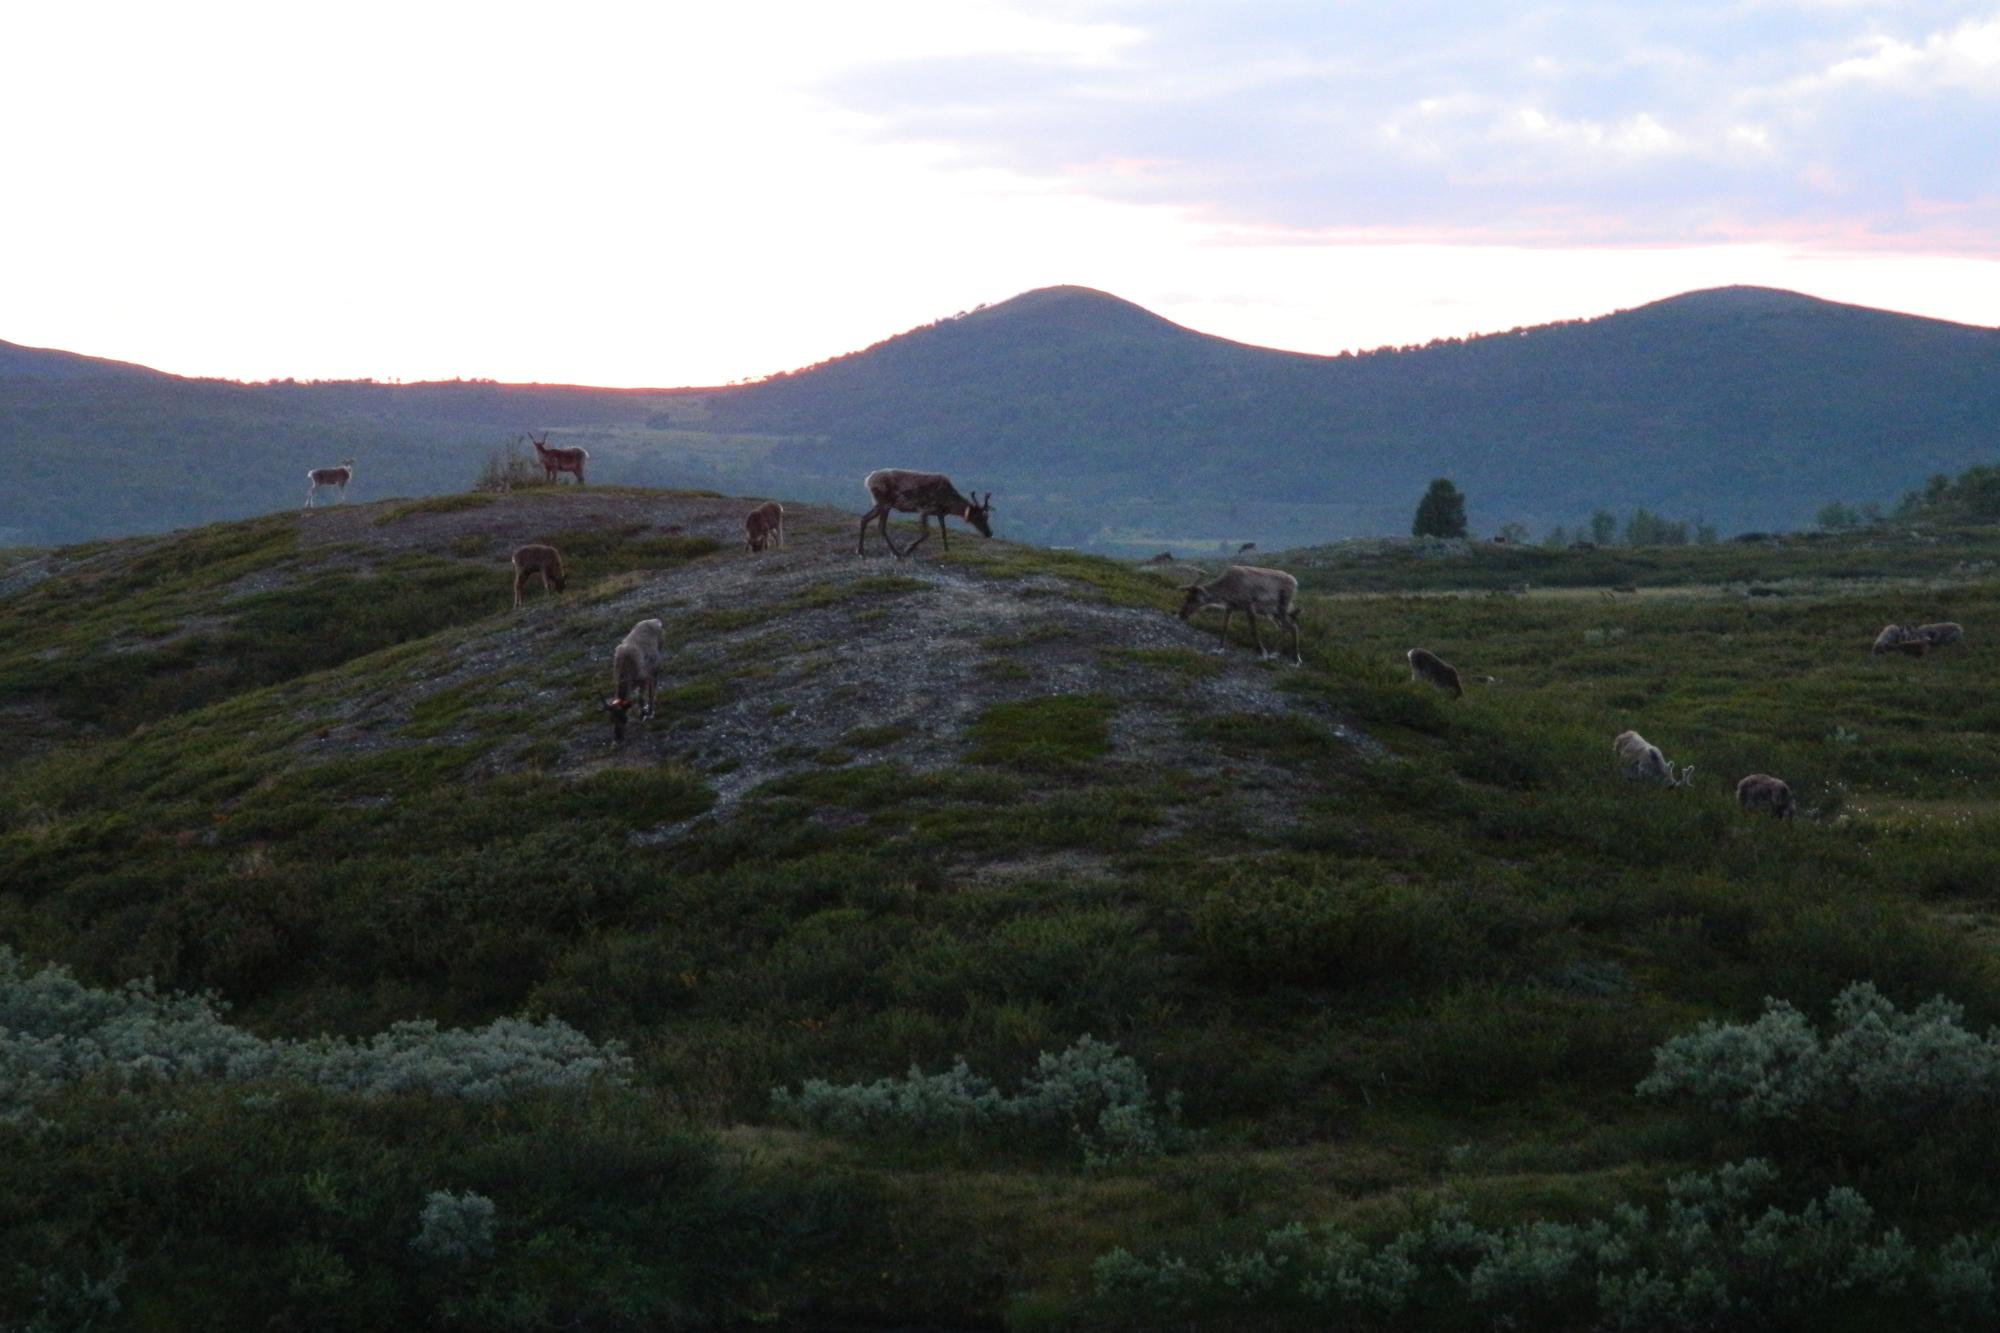 Reindeer graze in the cool of the night